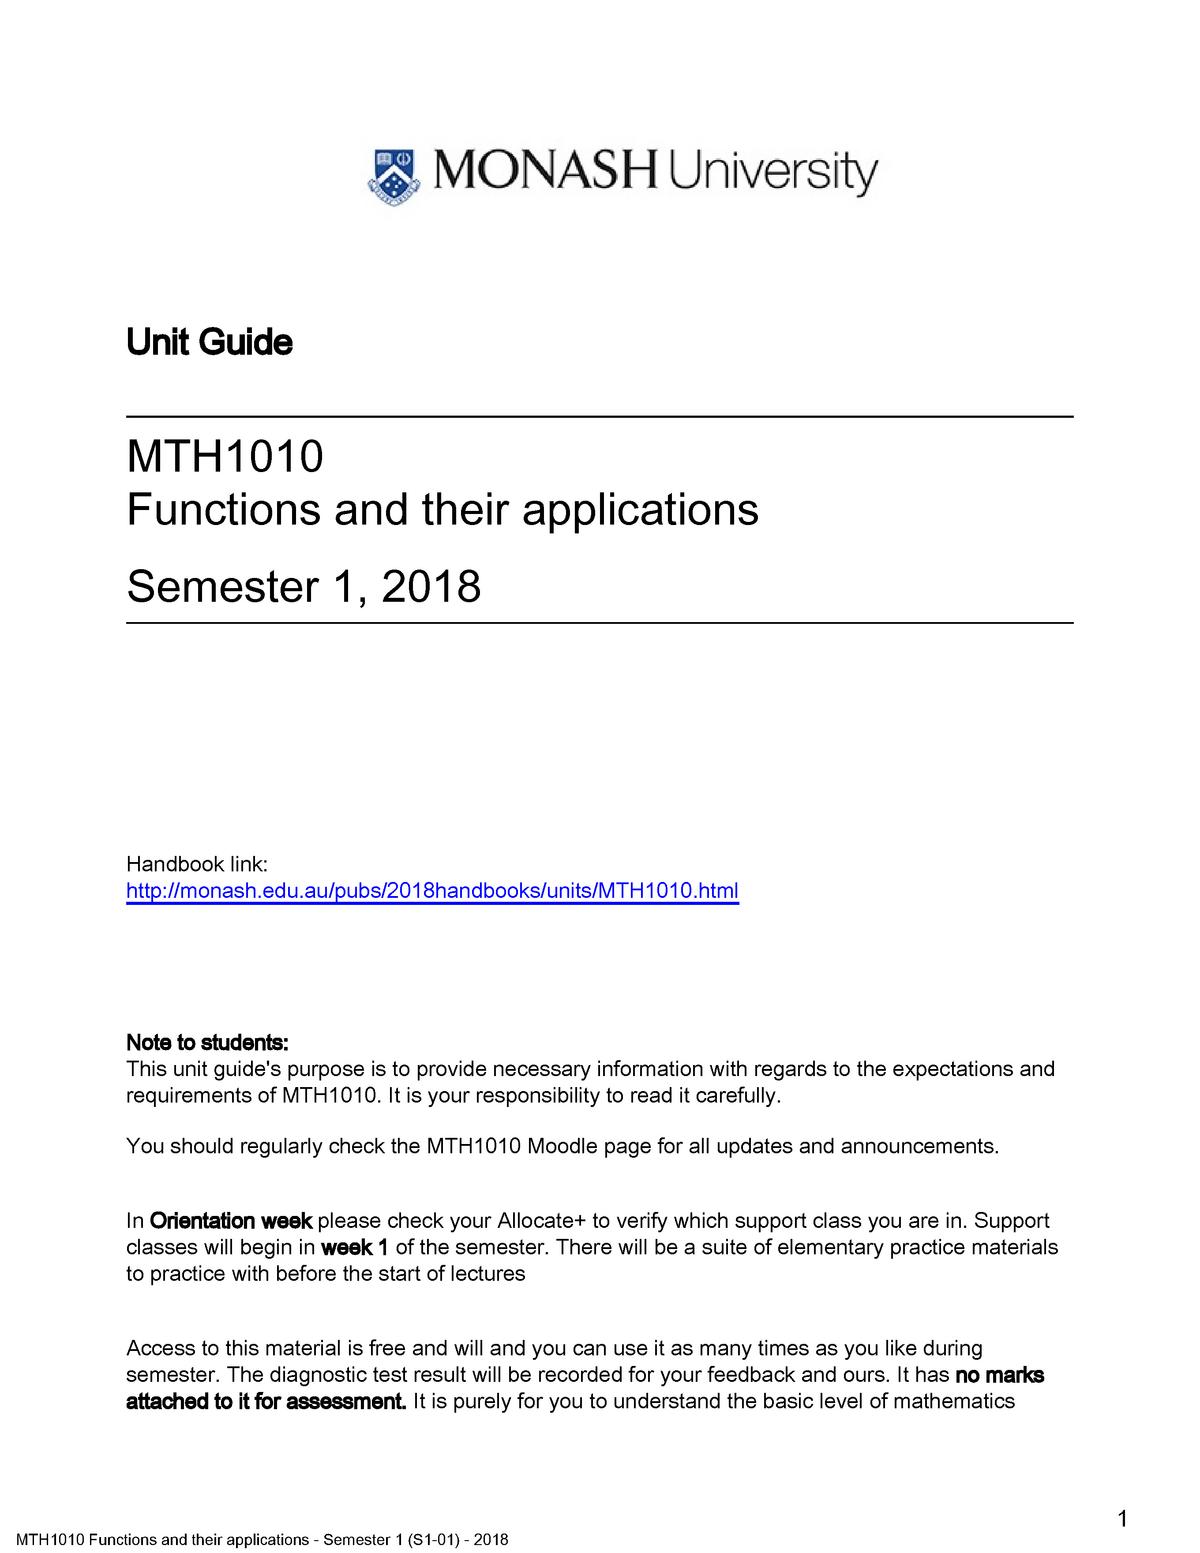 MTH1010 Semester 1(S1-01) 2018 - Monash - StuDocu